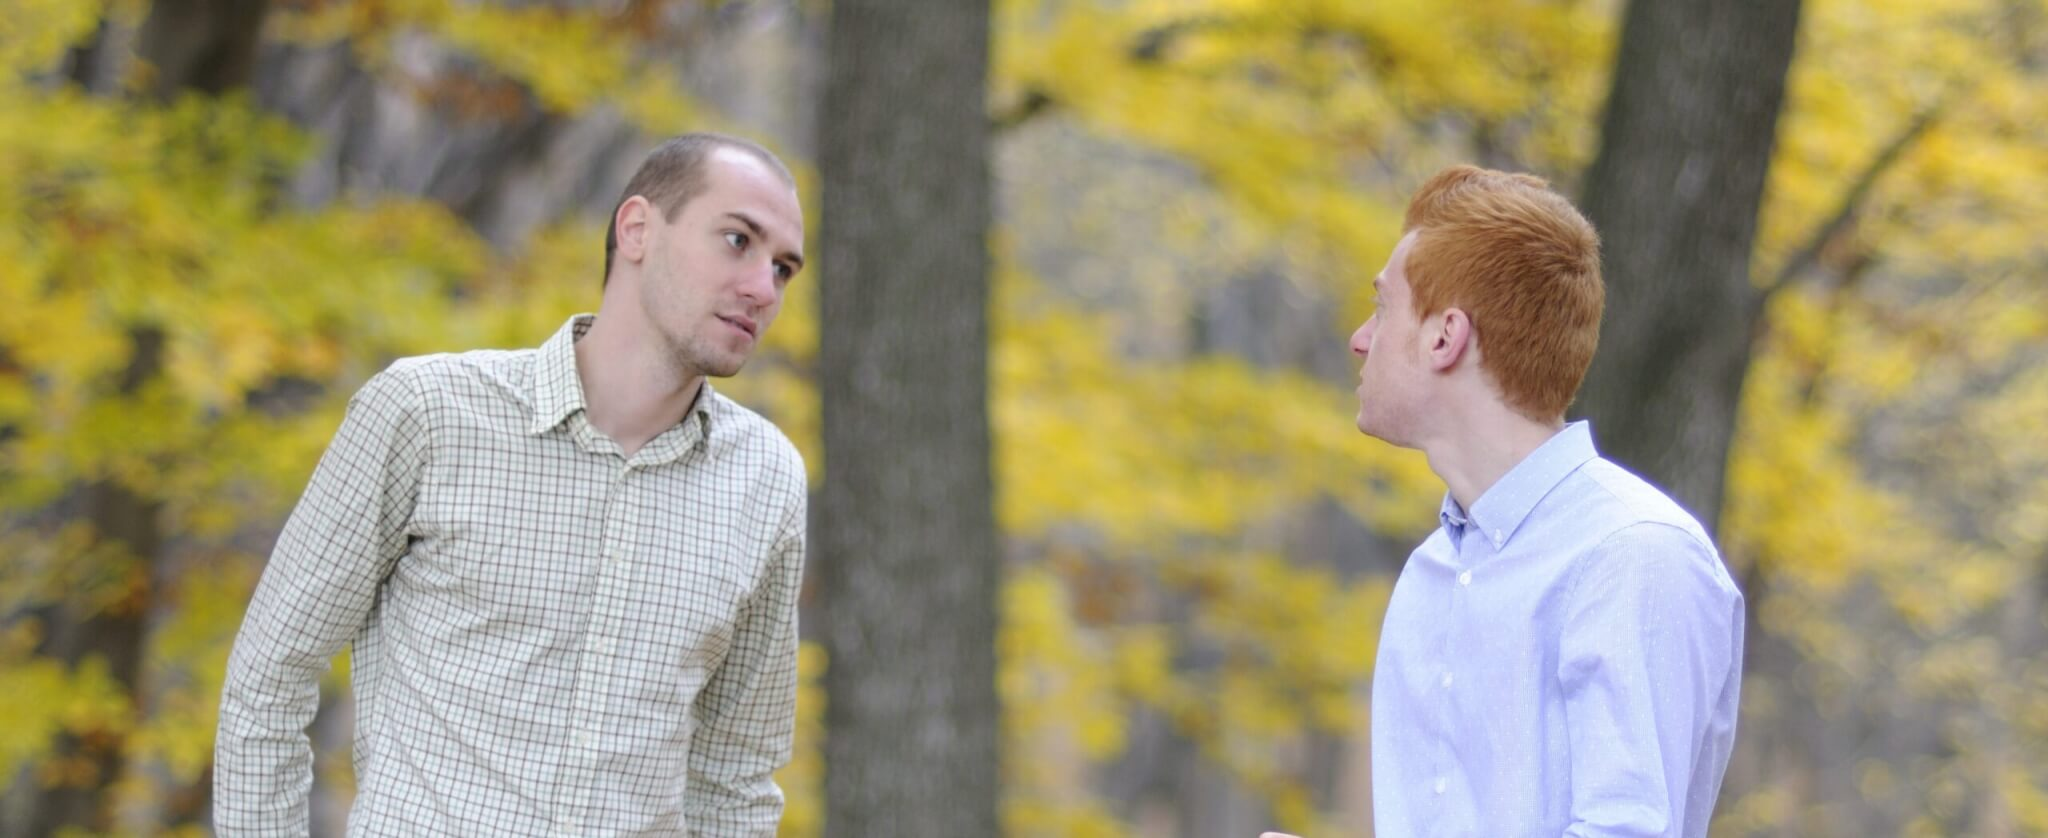 Civil partnerships – the dissolution process